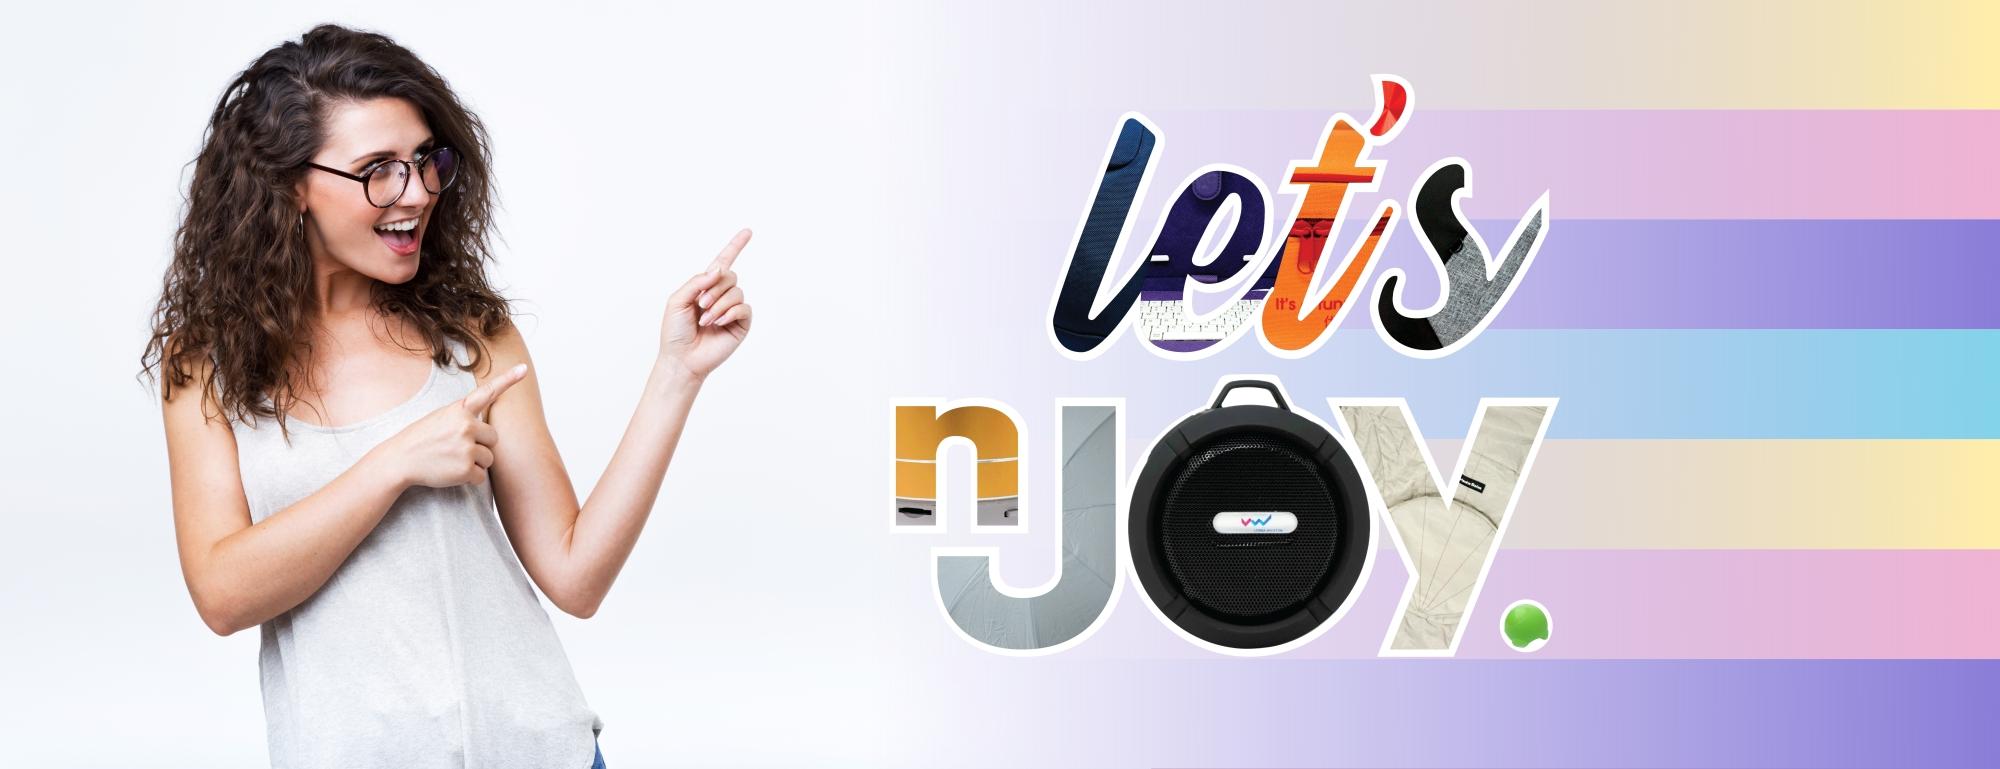 Banner nJOY